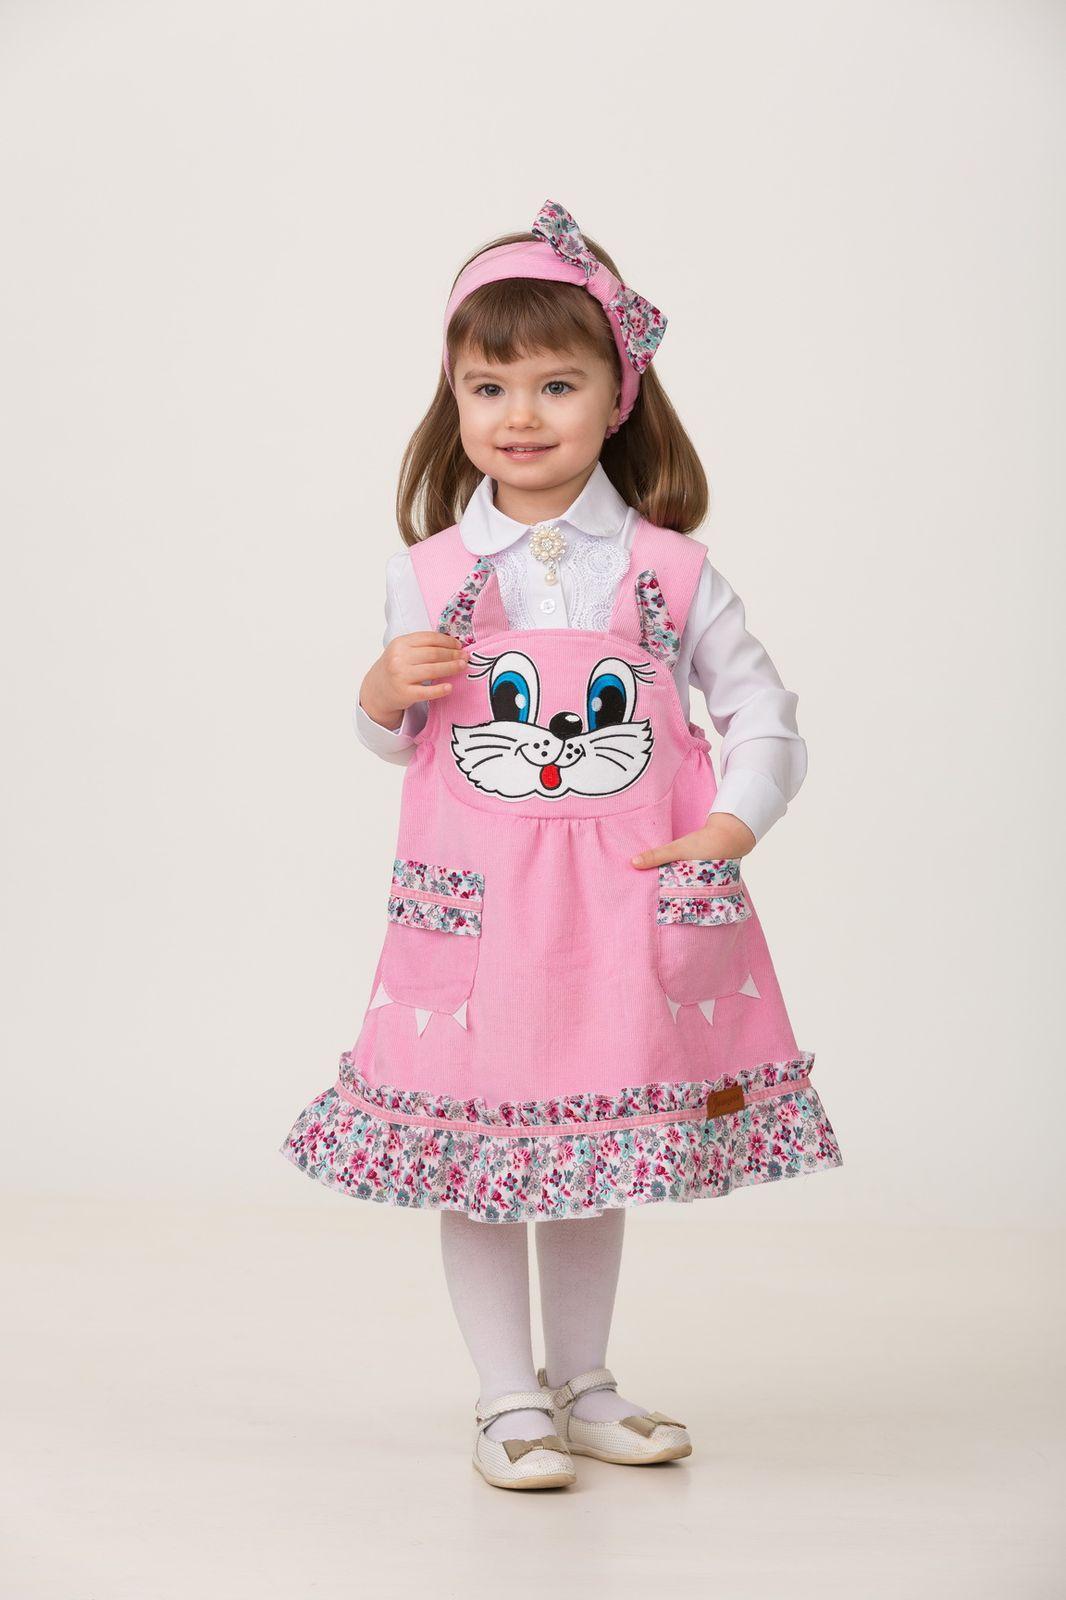 Карнавальный костюм Jeanees Кошечка Царапка, цвет: розовый. Размер: 30 карнавальный костюм jeanees зайка капризка цвет голубой размер 30